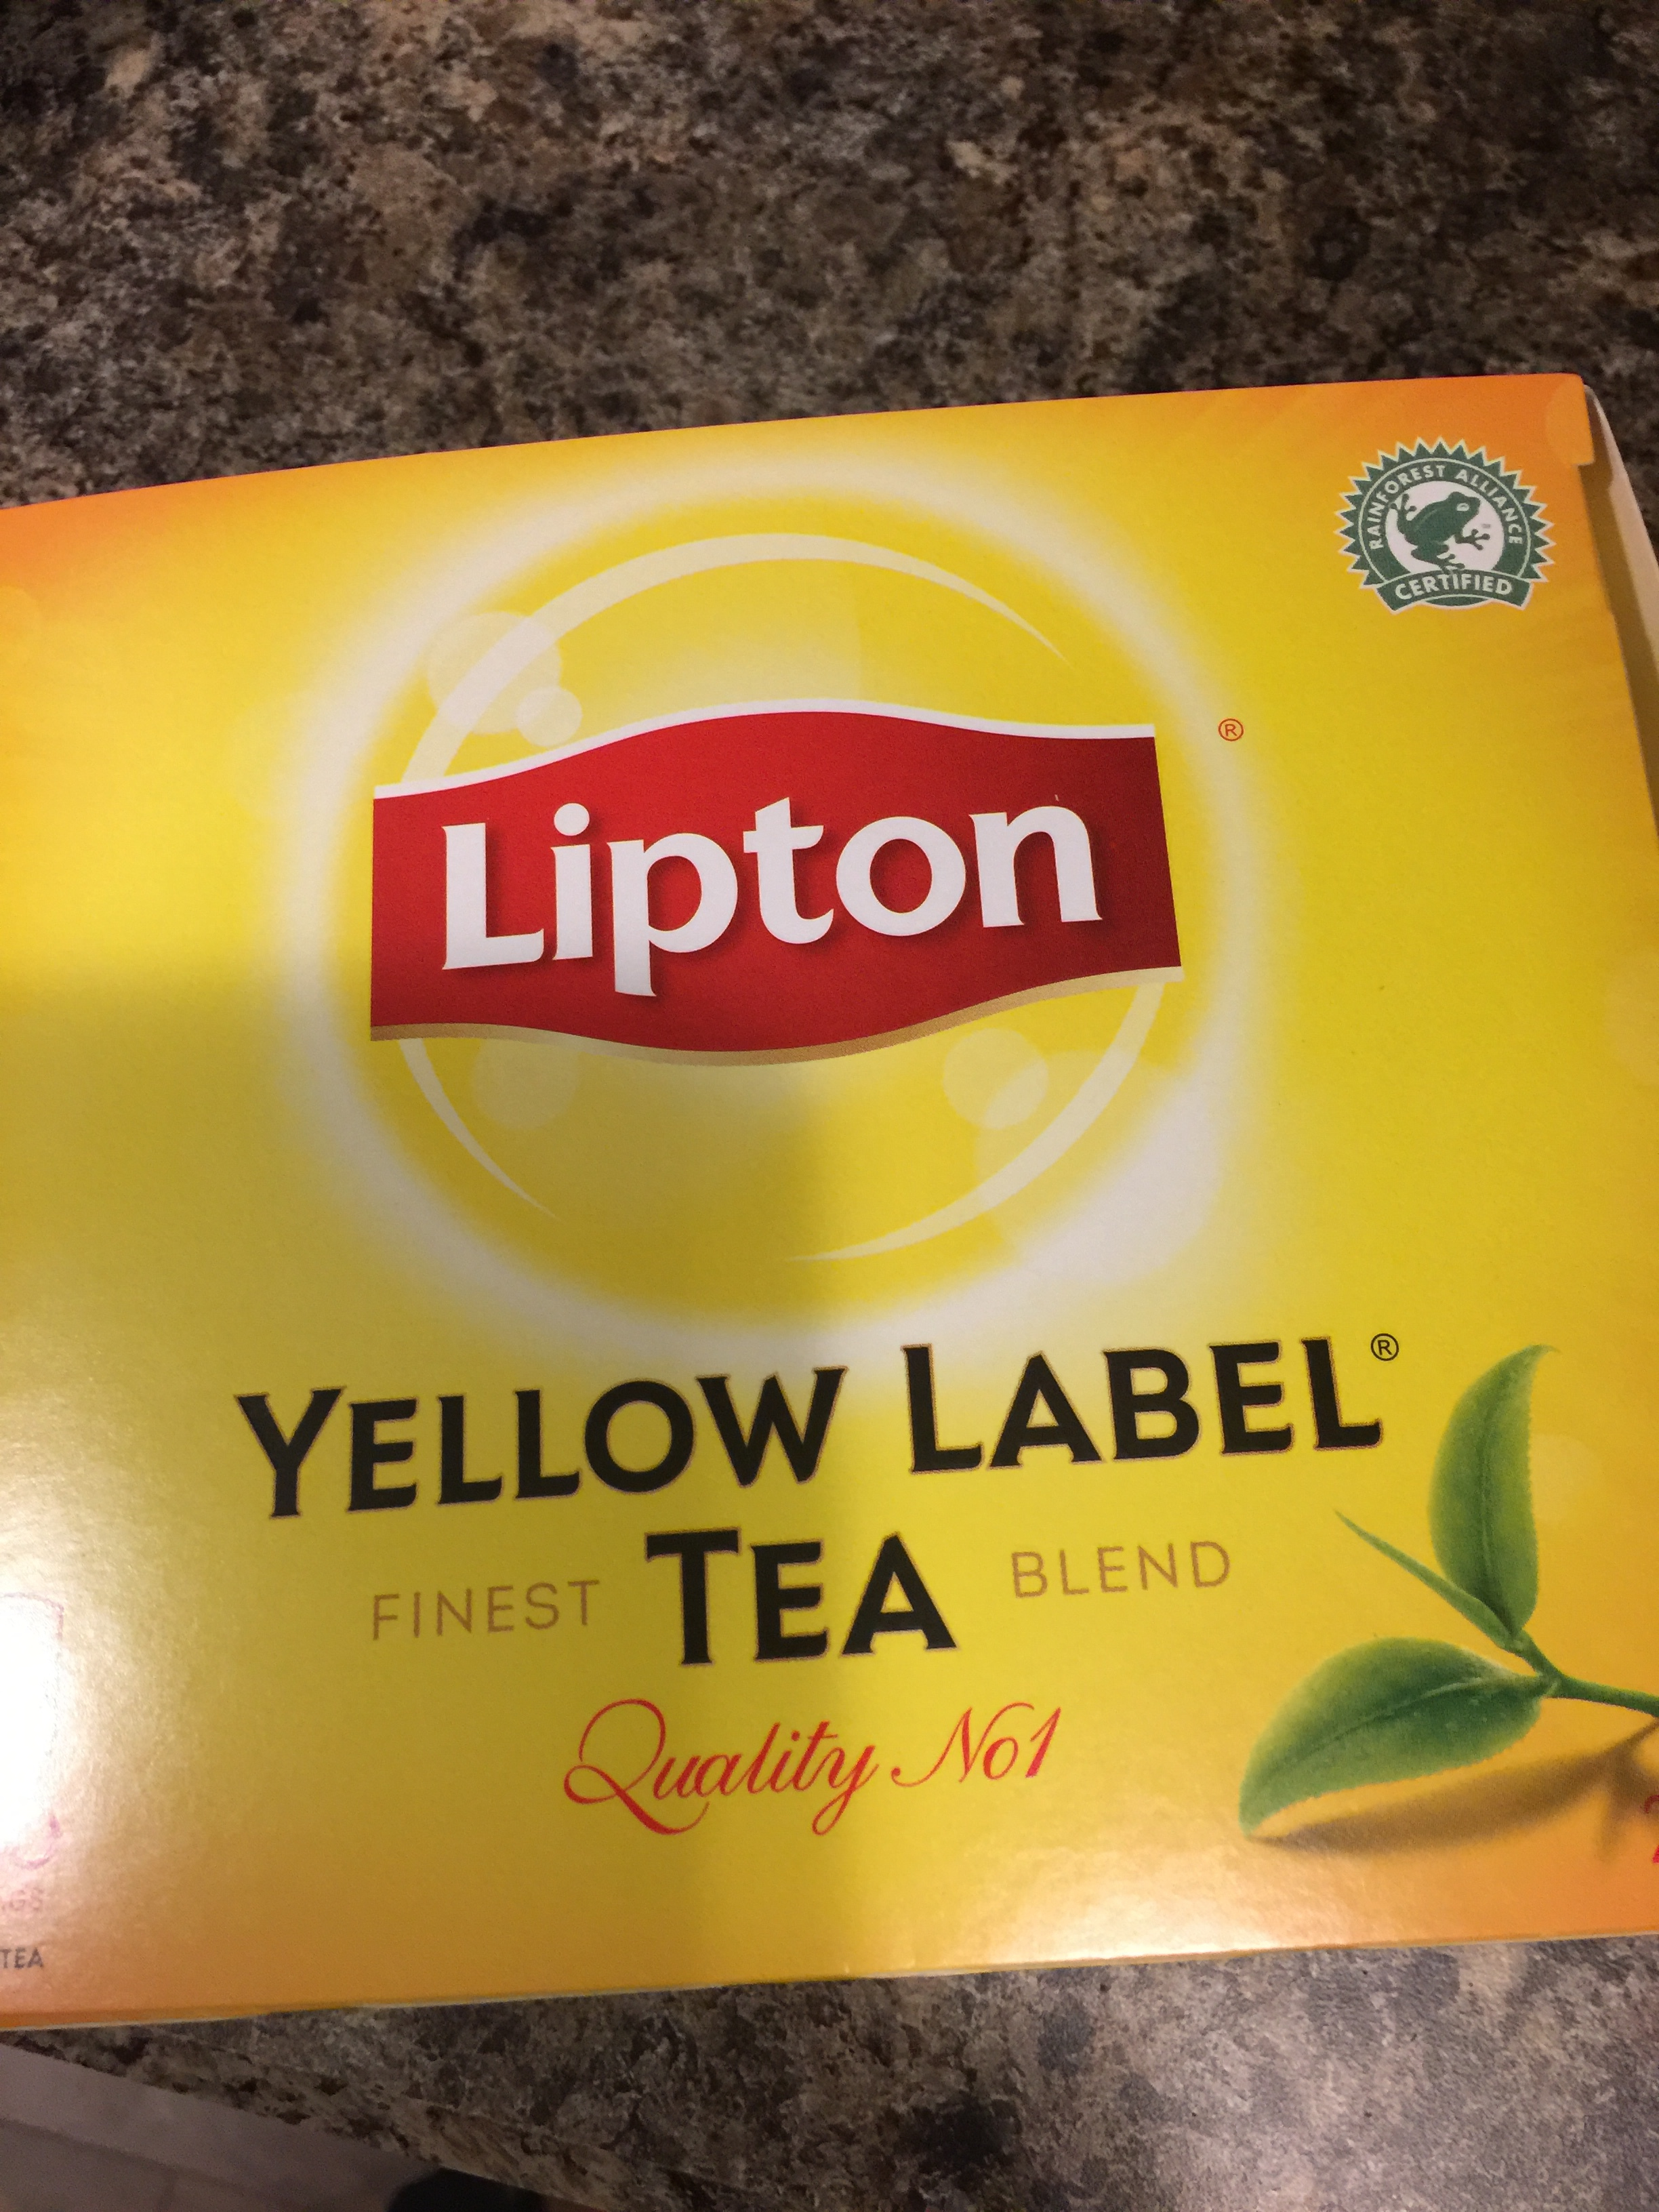 Lipton Yellow Label Tea Bags Reviews In Tea